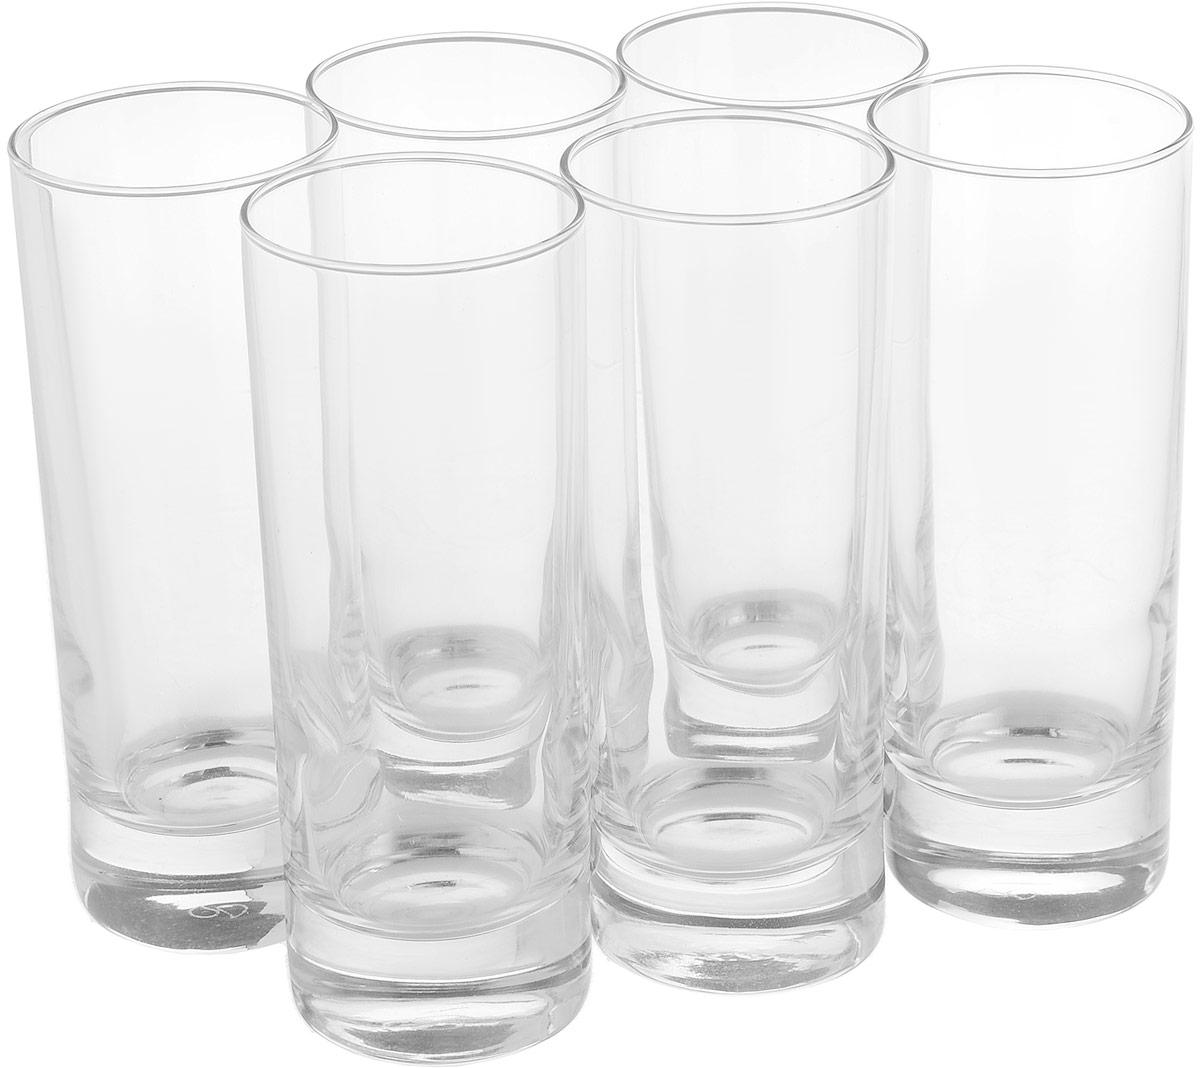 Набор стаканов Pasabahce Сиде, 215 мл, 6 шт набор стаканов pasabahce valse 315 мл 6 шт